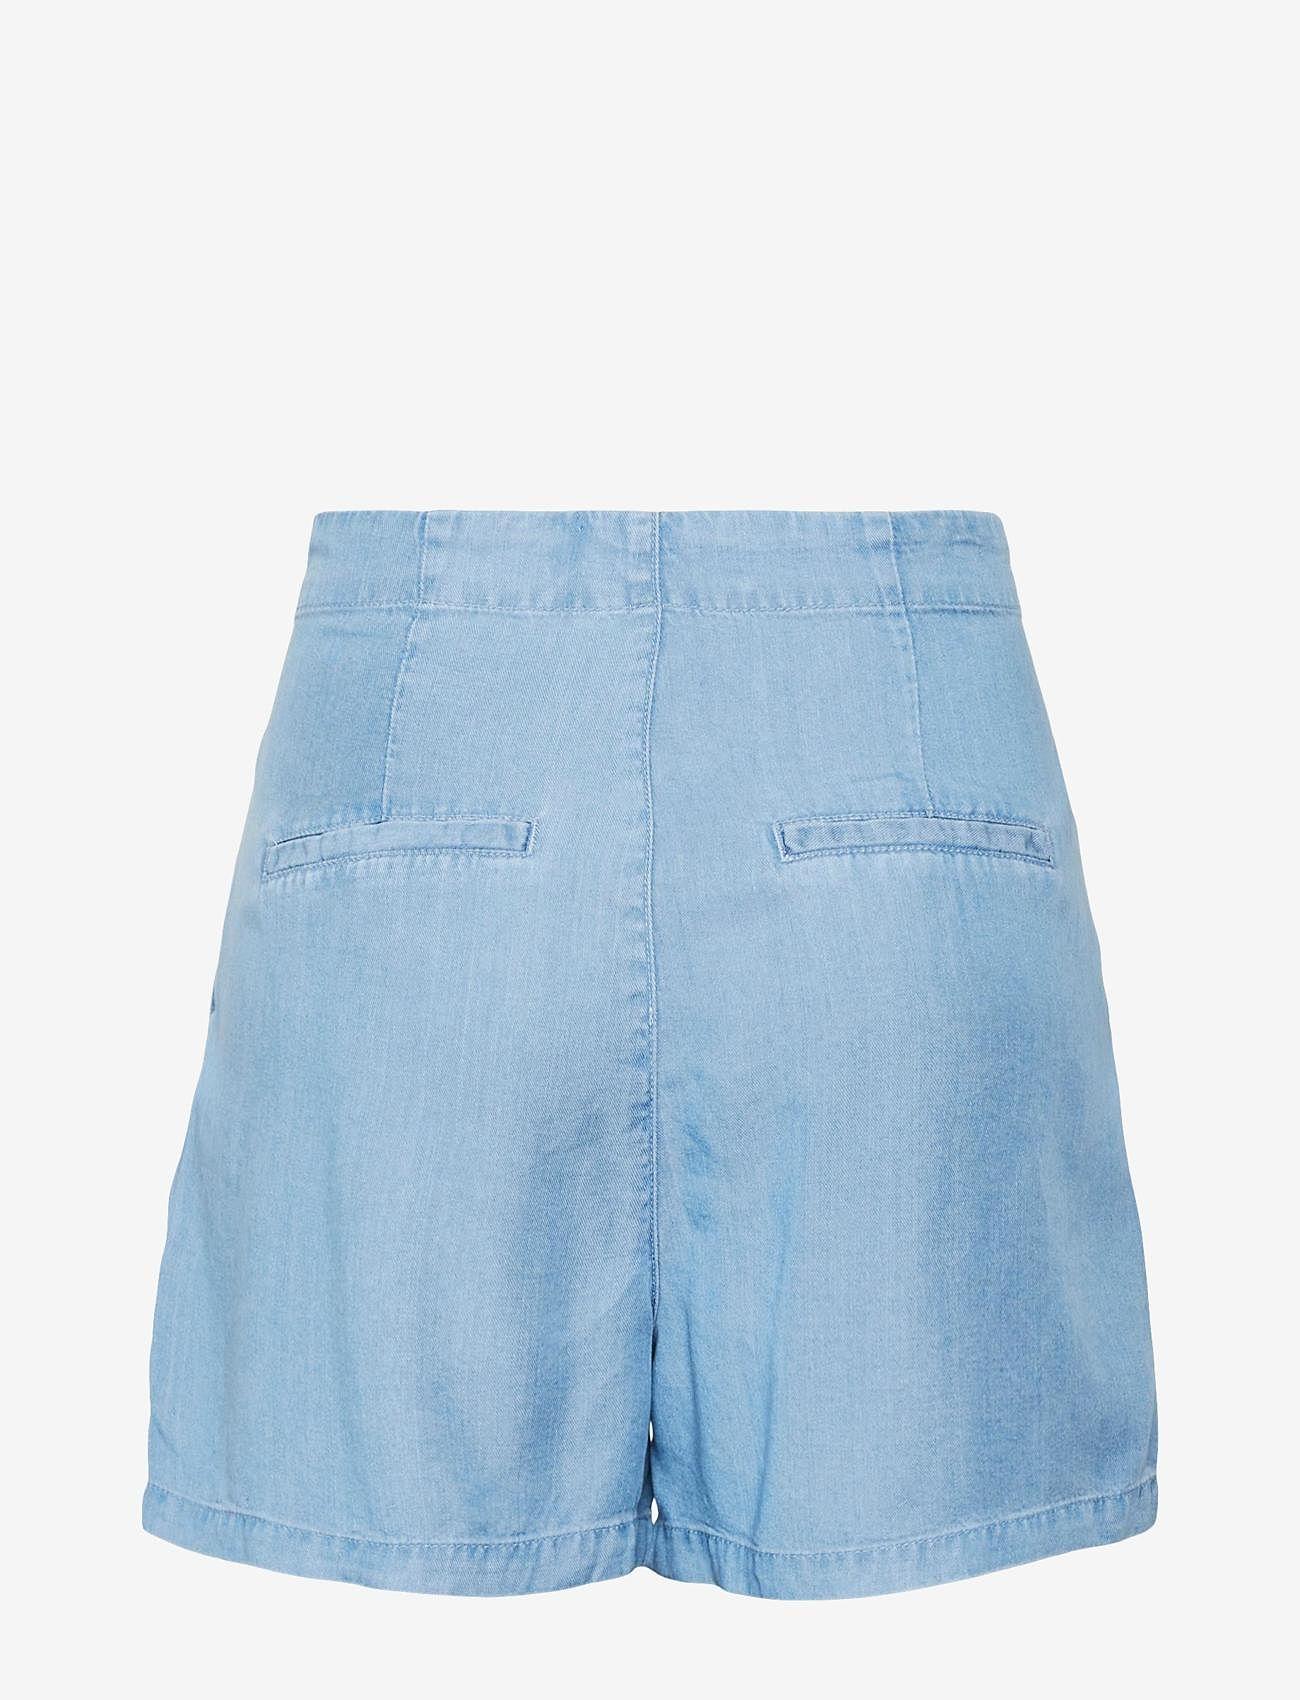 Vero Moda - VMMIA HR LOOSE SUMMER SHORTS GA - jeansshorts - light blue denim - 1